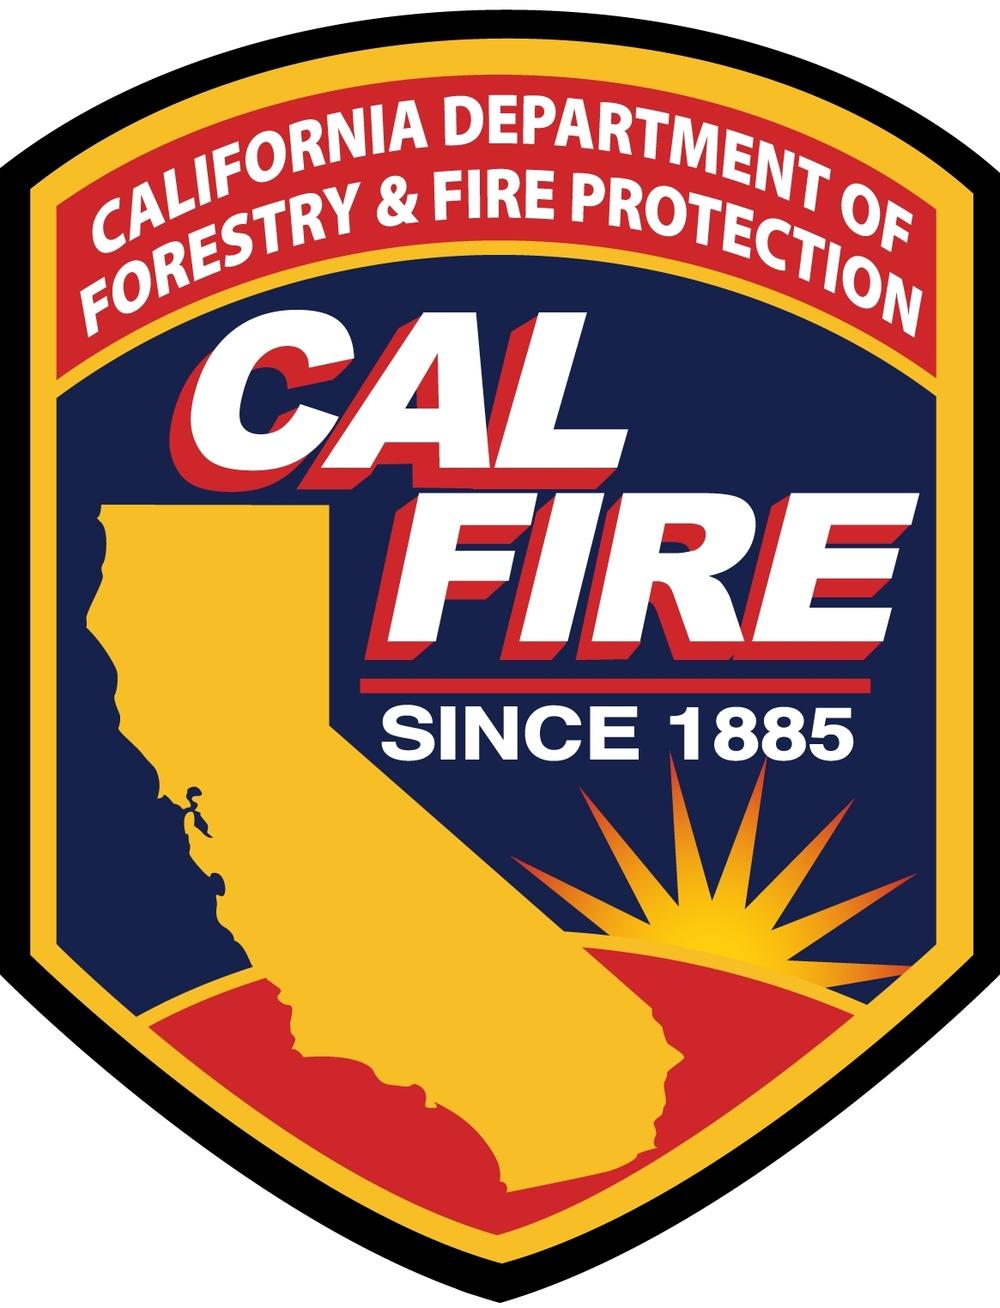 CAL_FIRE_logo_large.jpg